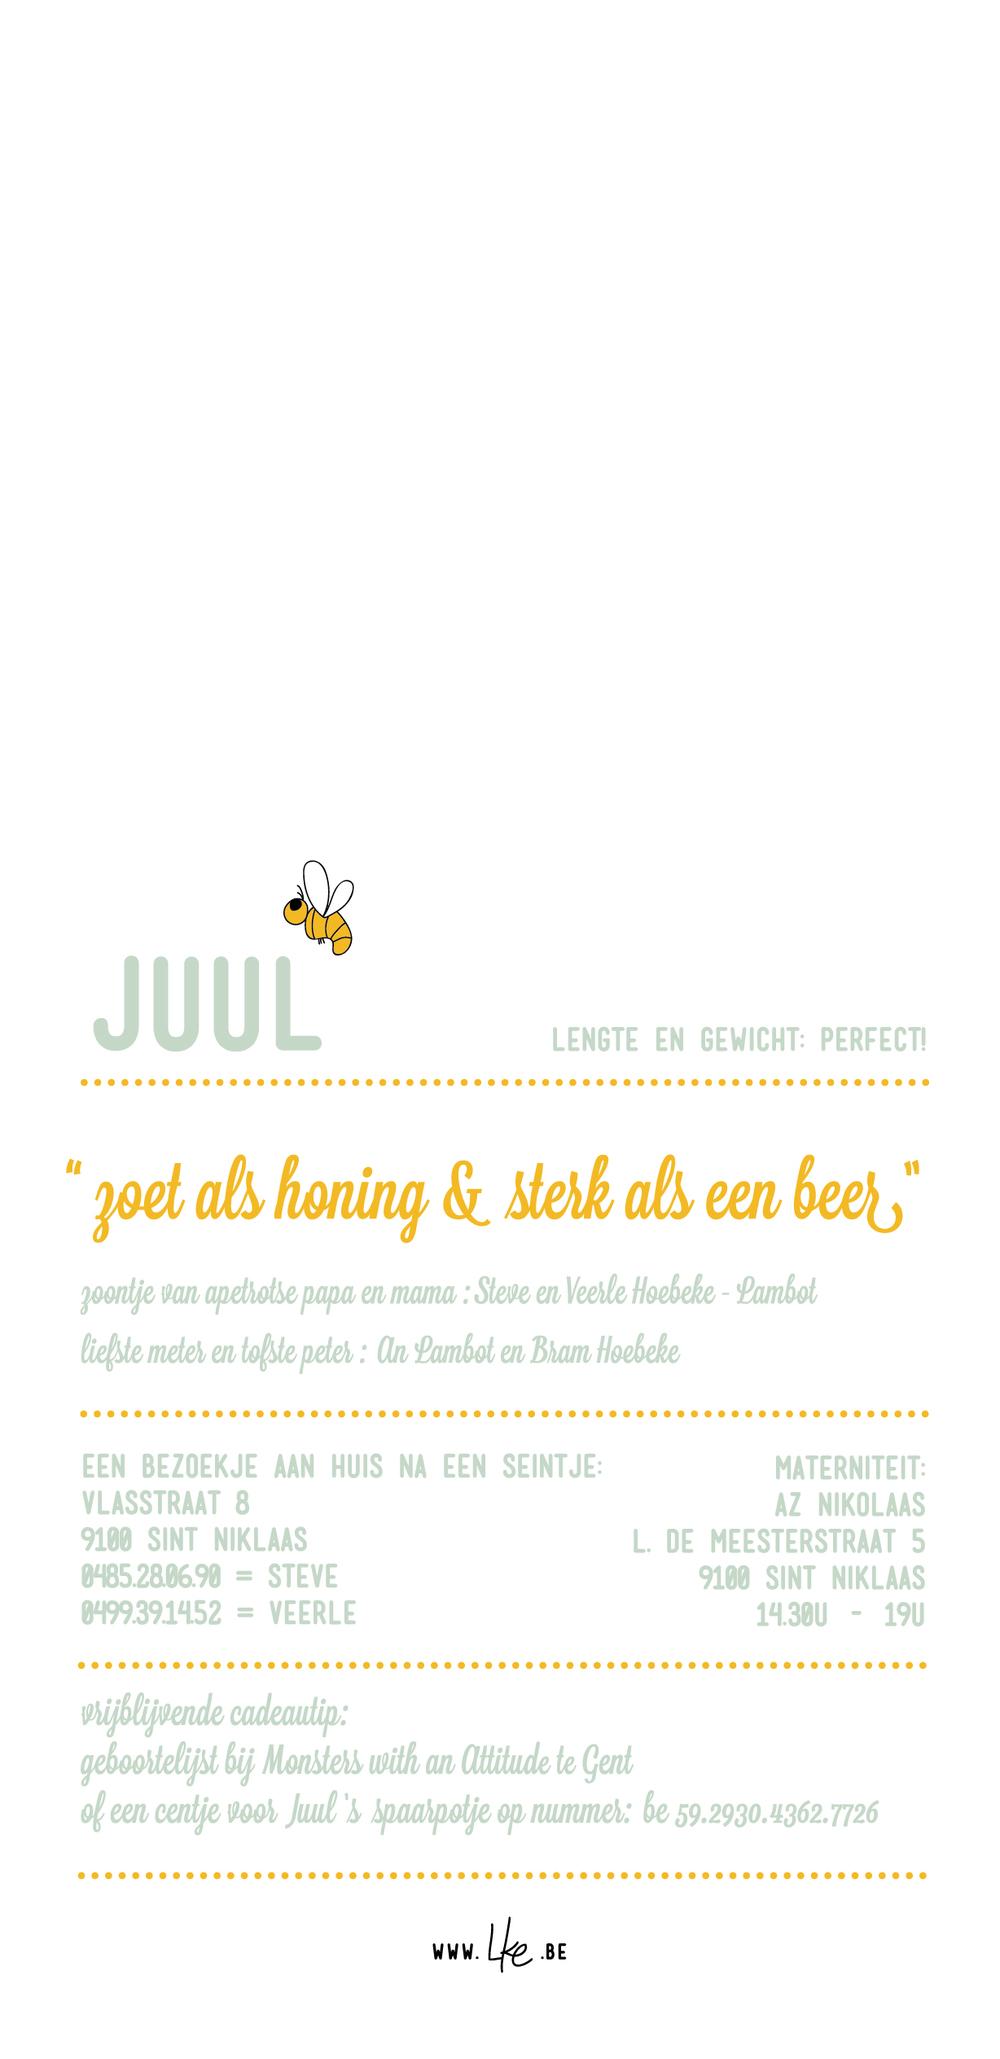 KVD Juul H kaartje-02.jpg